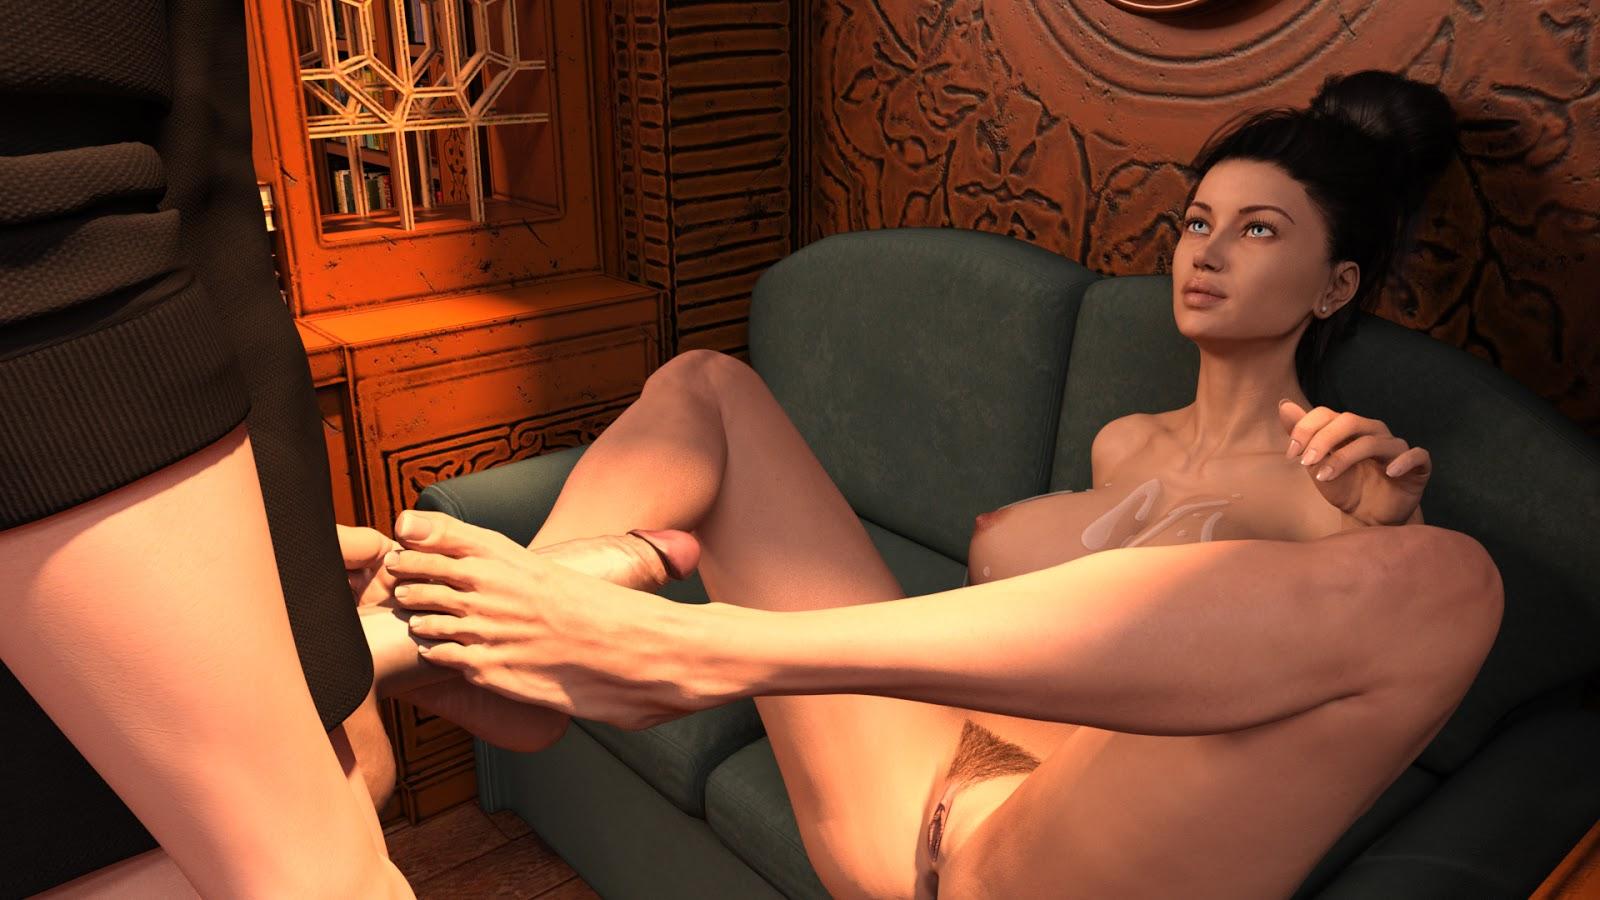 deep pussy rub fucking porn photos